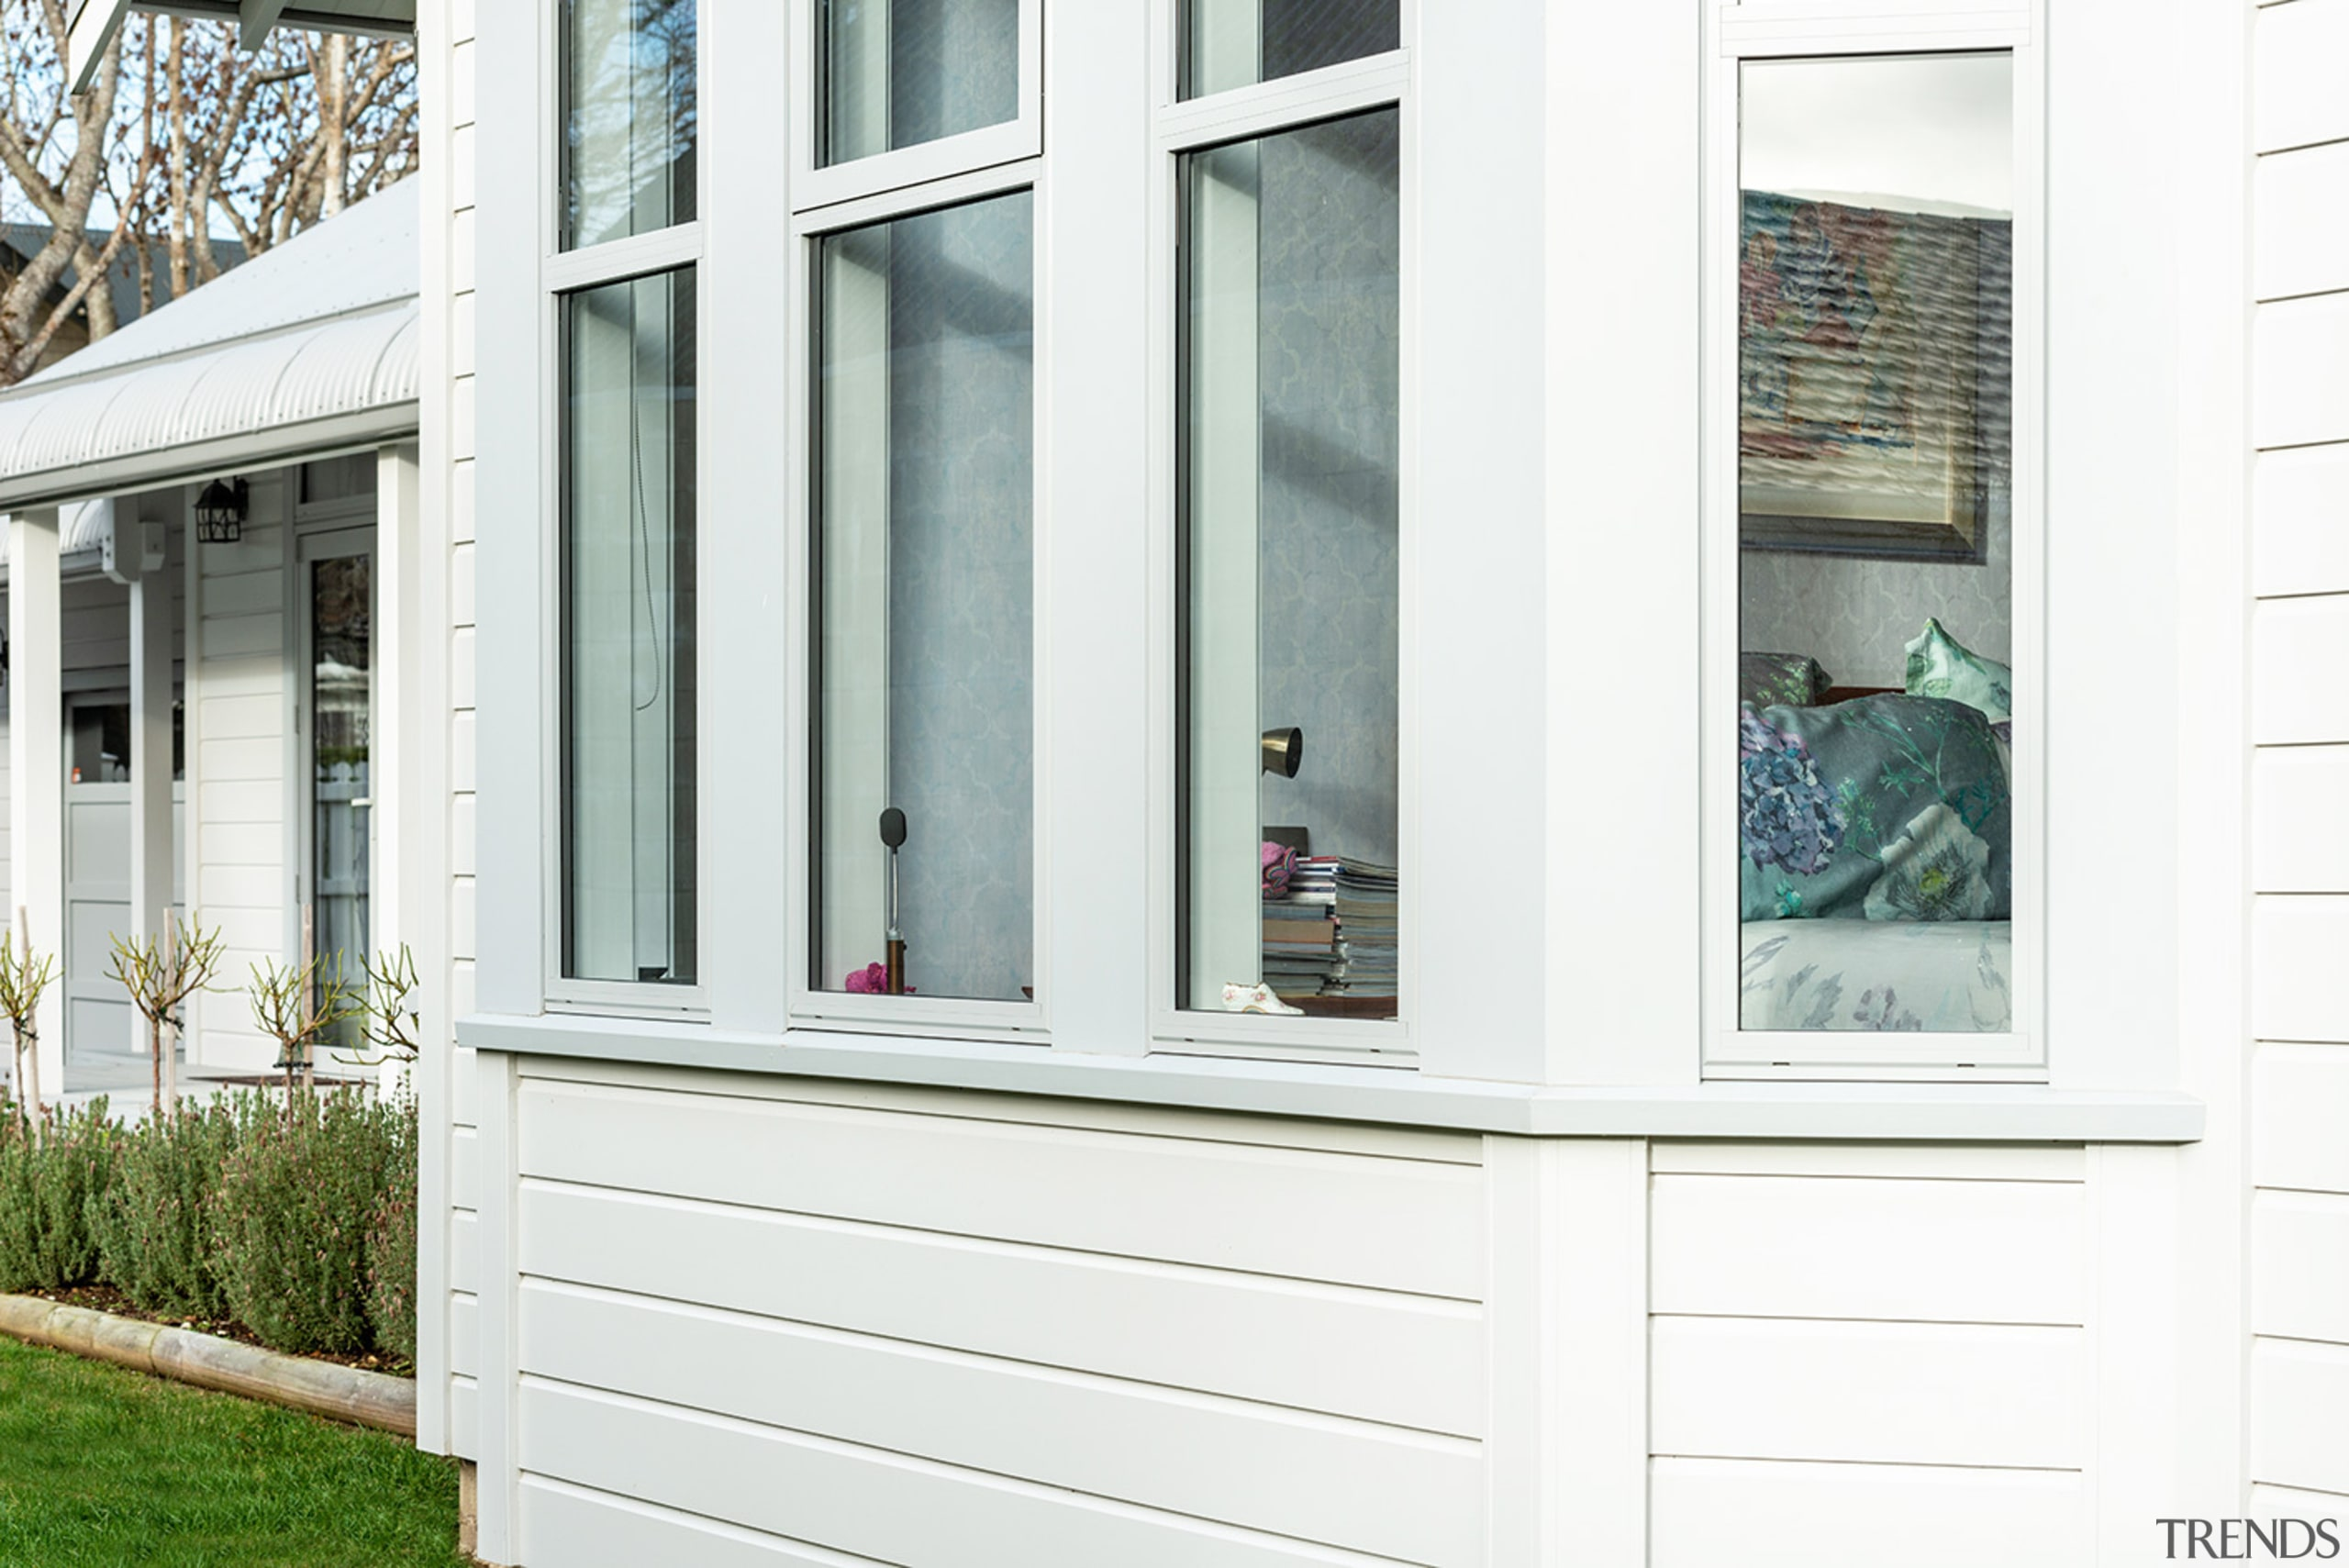 Envira Timber Window Sills Complete The Classic Villa door, facade, home, house, porch, siding, window, white